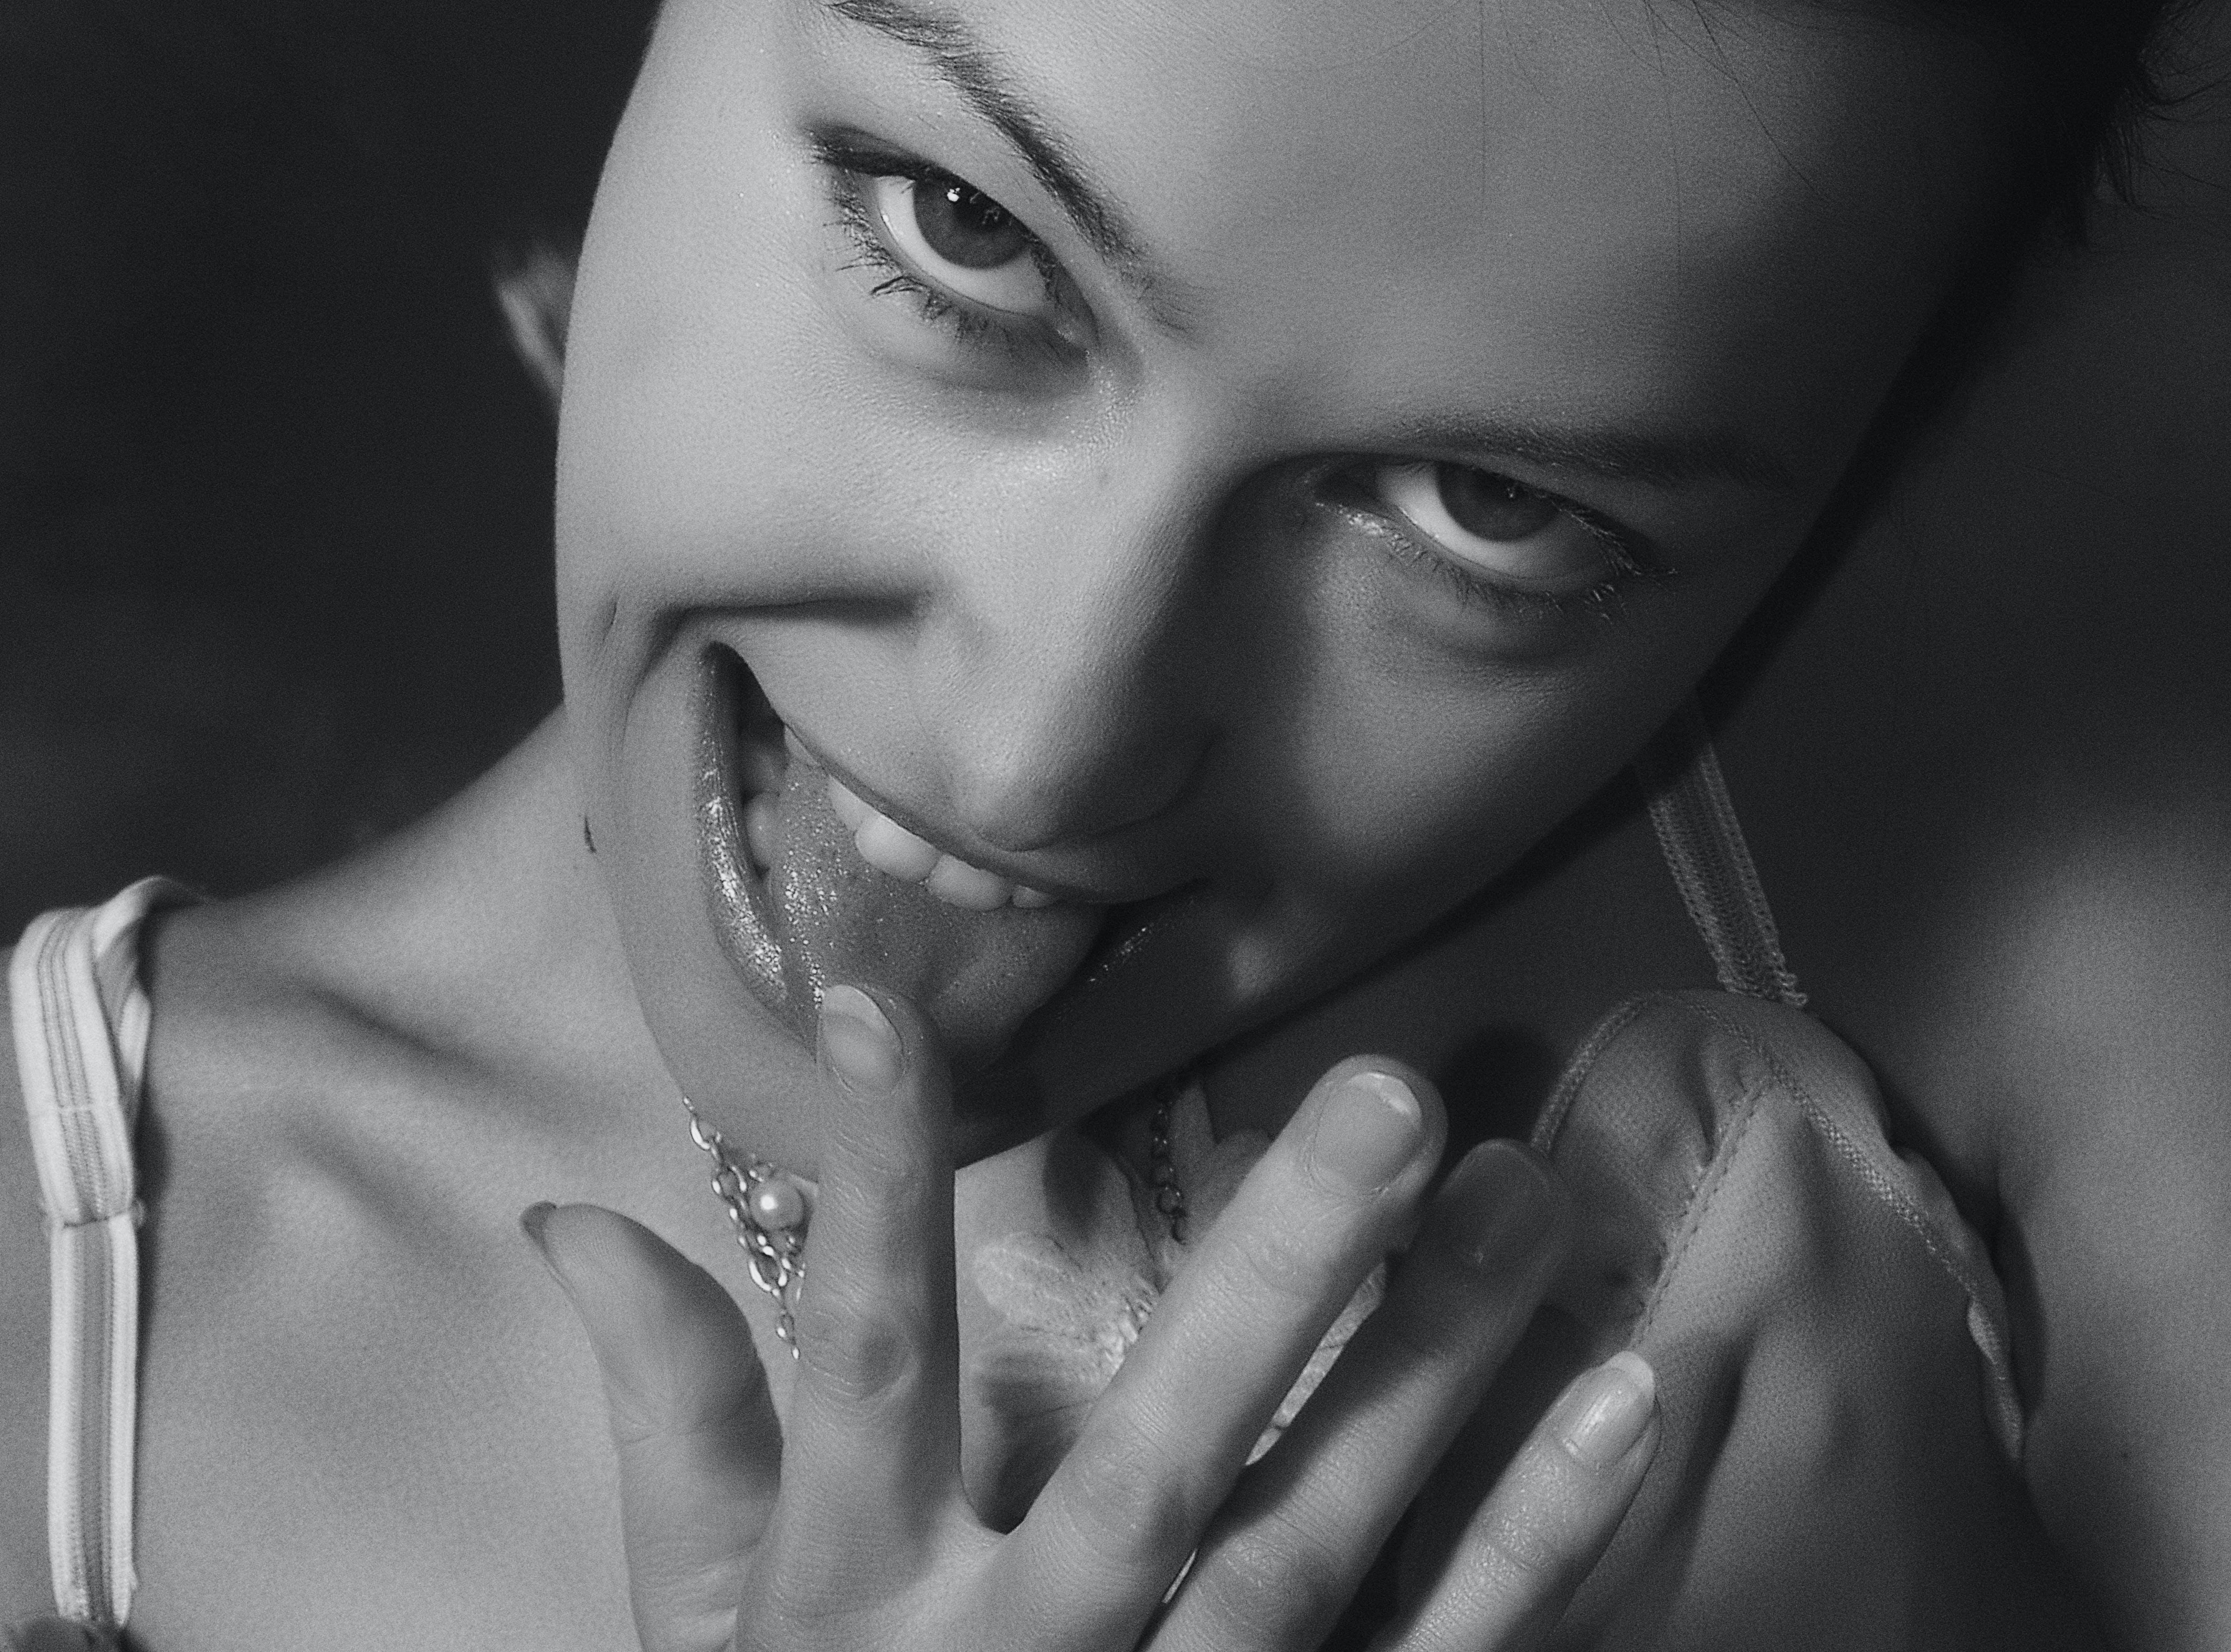 Gratis arkivbilde med глаза, губы, девушка, женский пол